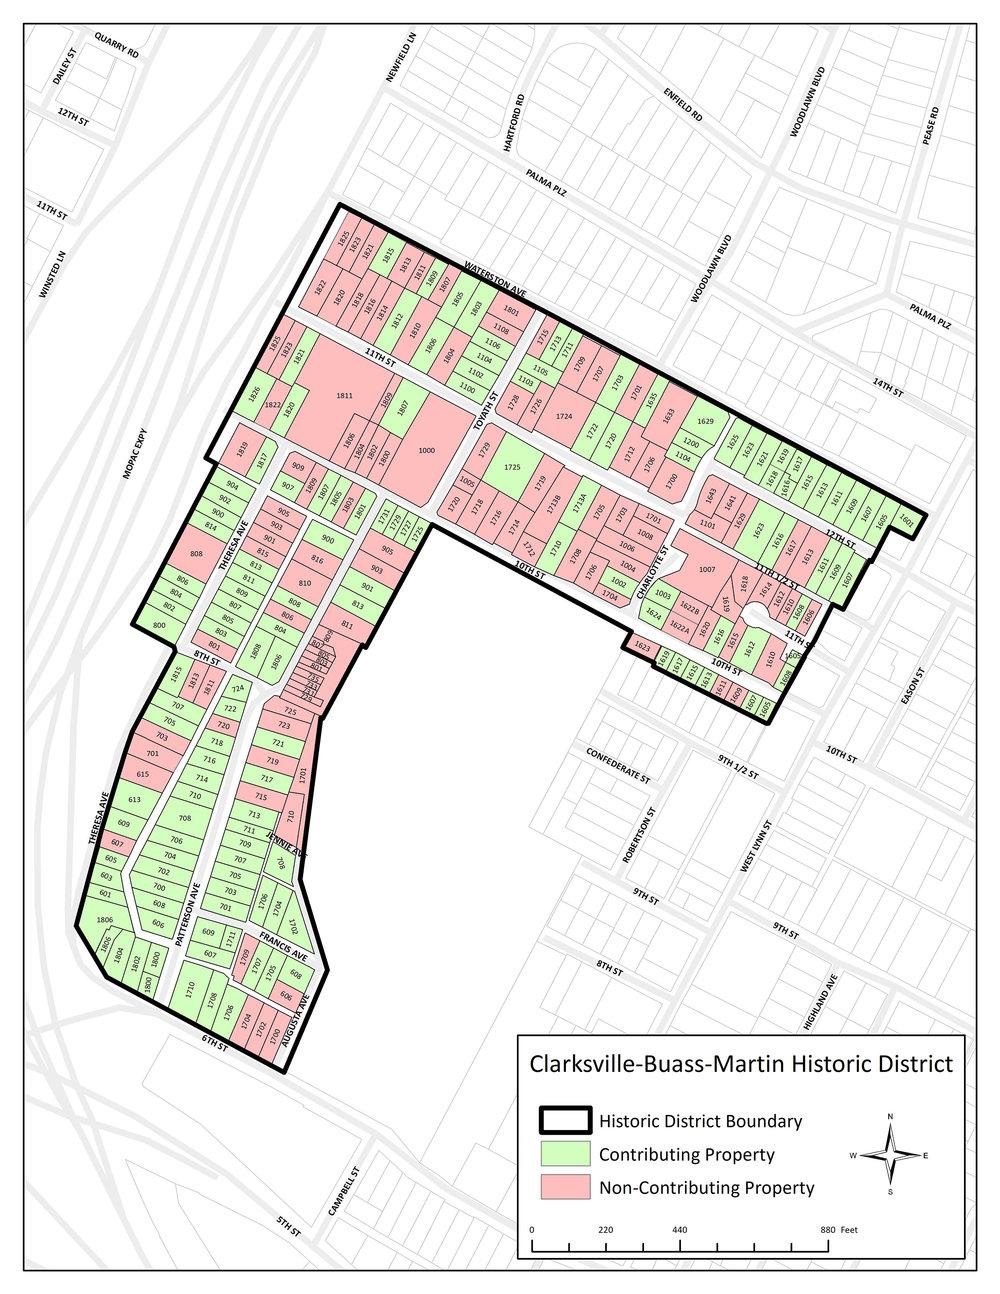 Clarksville-Map_Addr-as-label_Jan2019.jpg